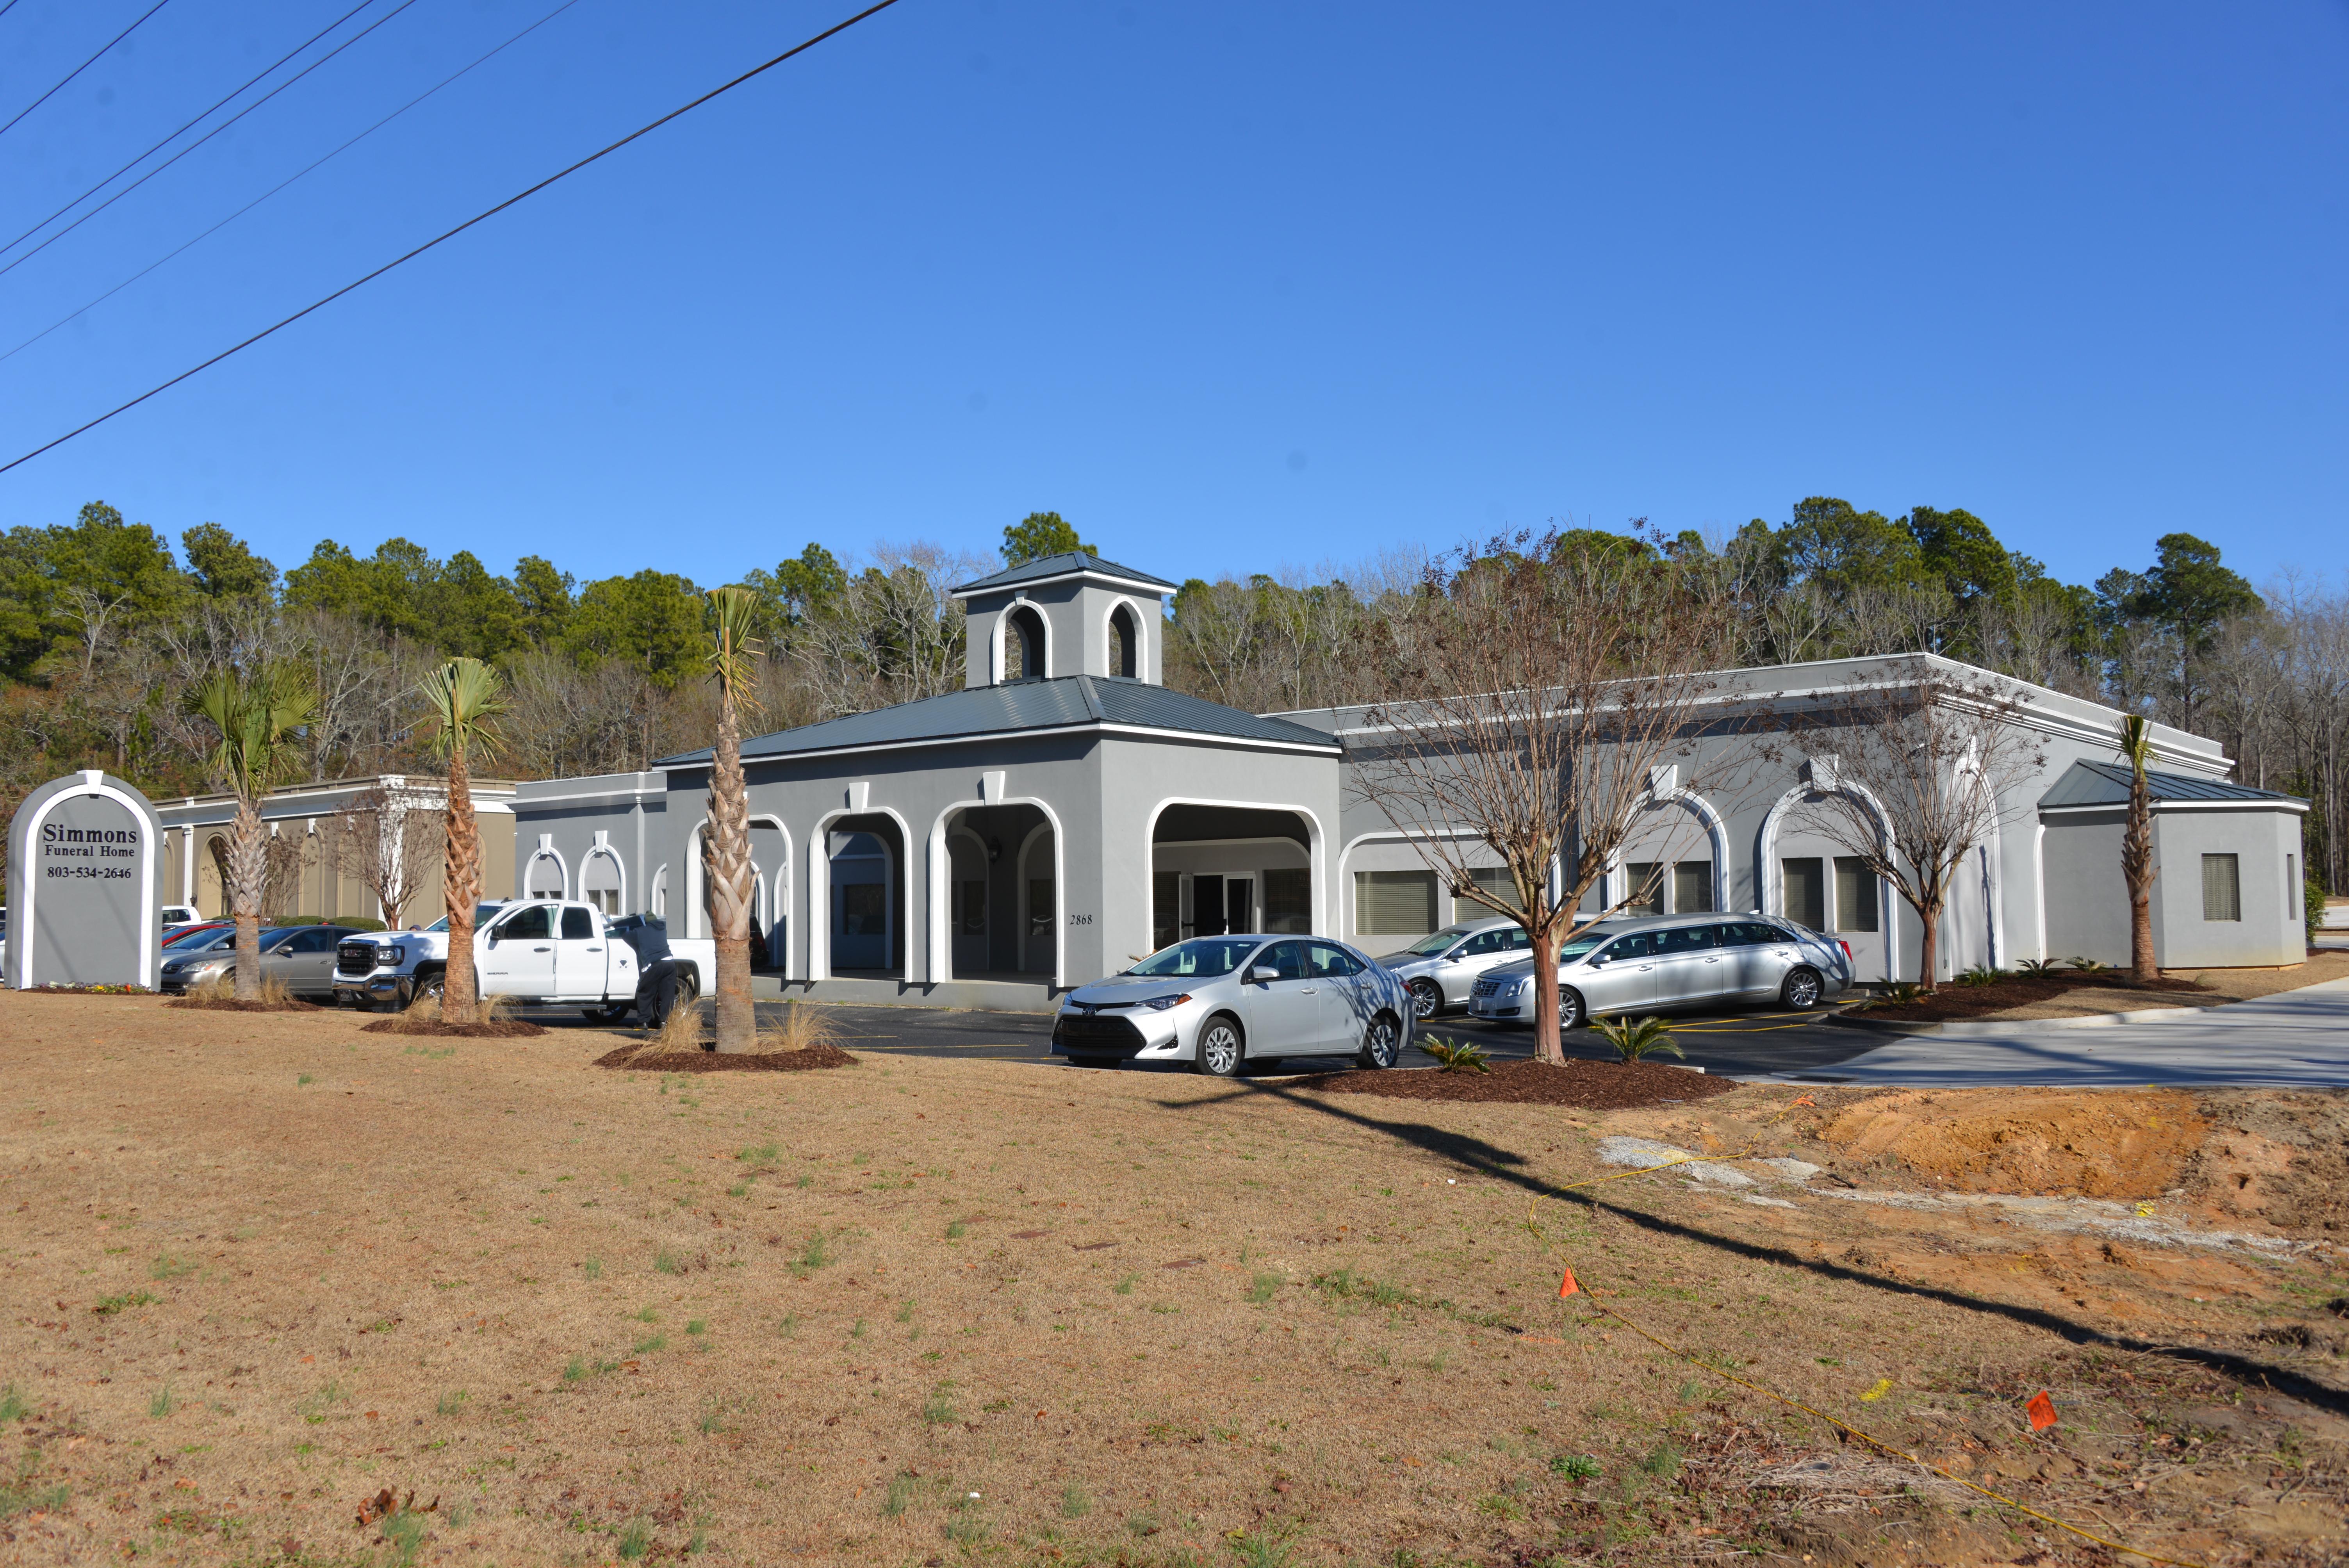 Simmons Funeral Home - Orangeburg, South Carolina and Santee